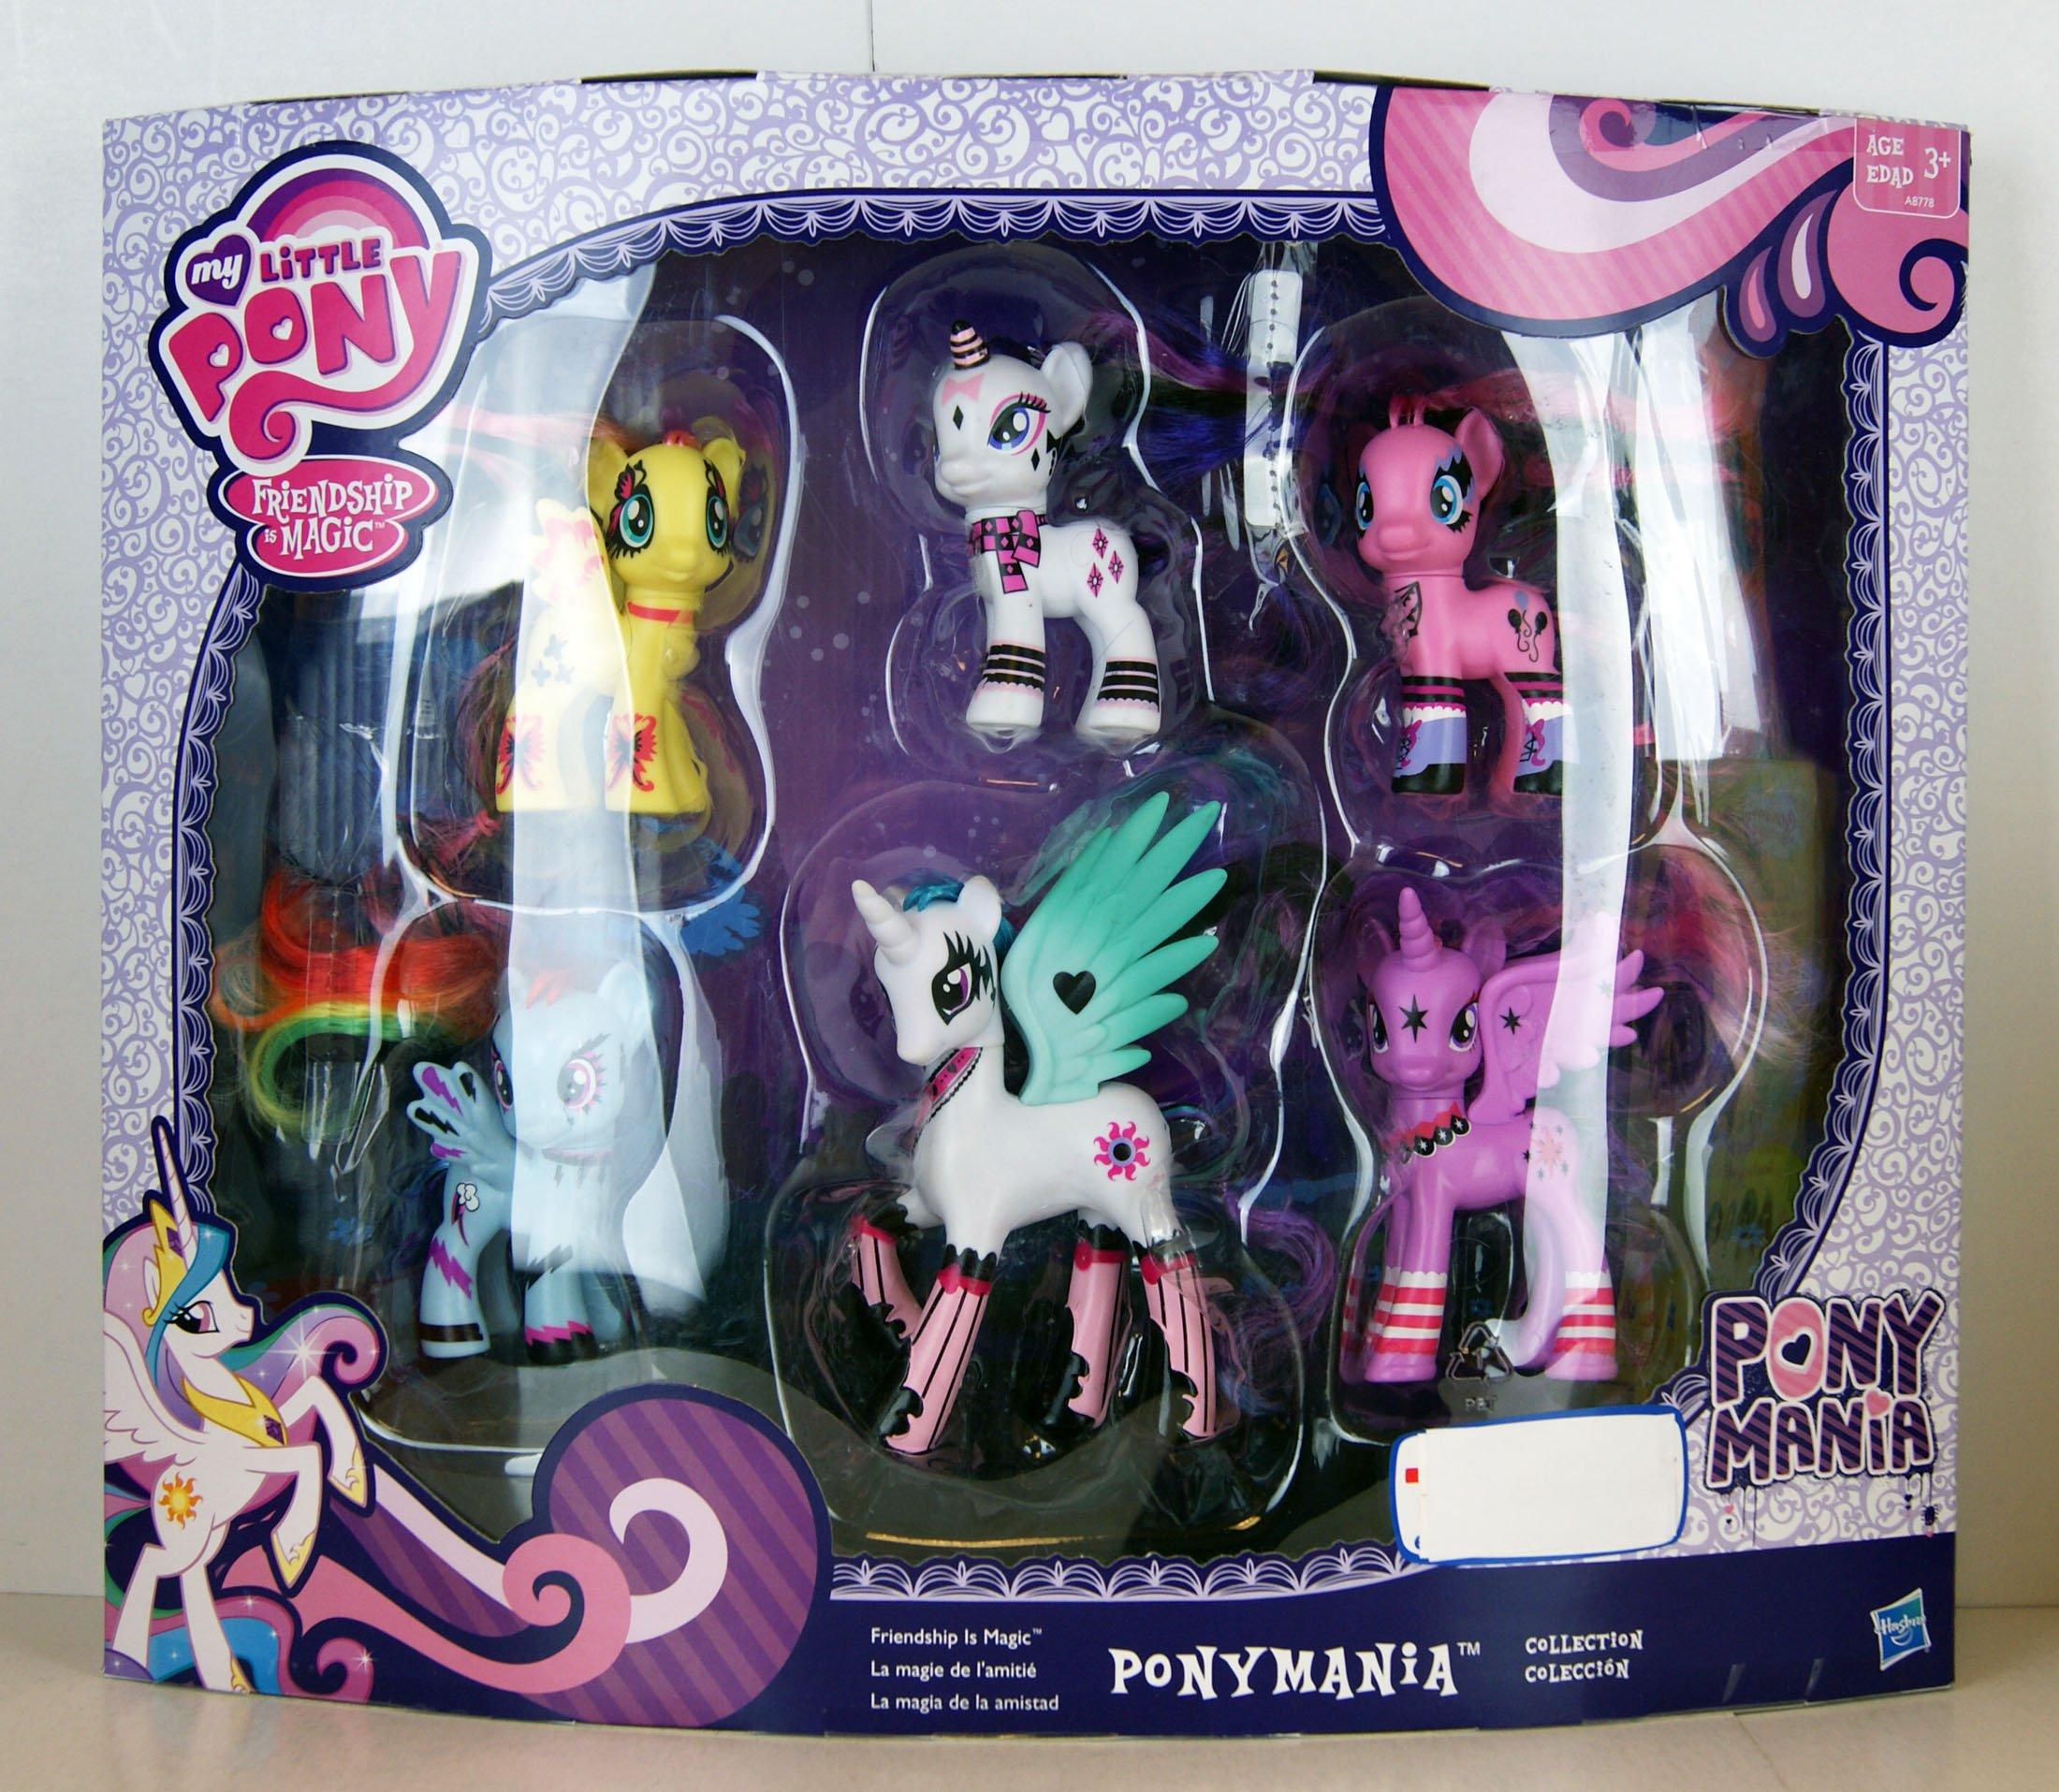 Amazon.es: My Little Pony Friendship Is Magic Pony Mania 6 Pack by Hasbro: Juguetes y juegos